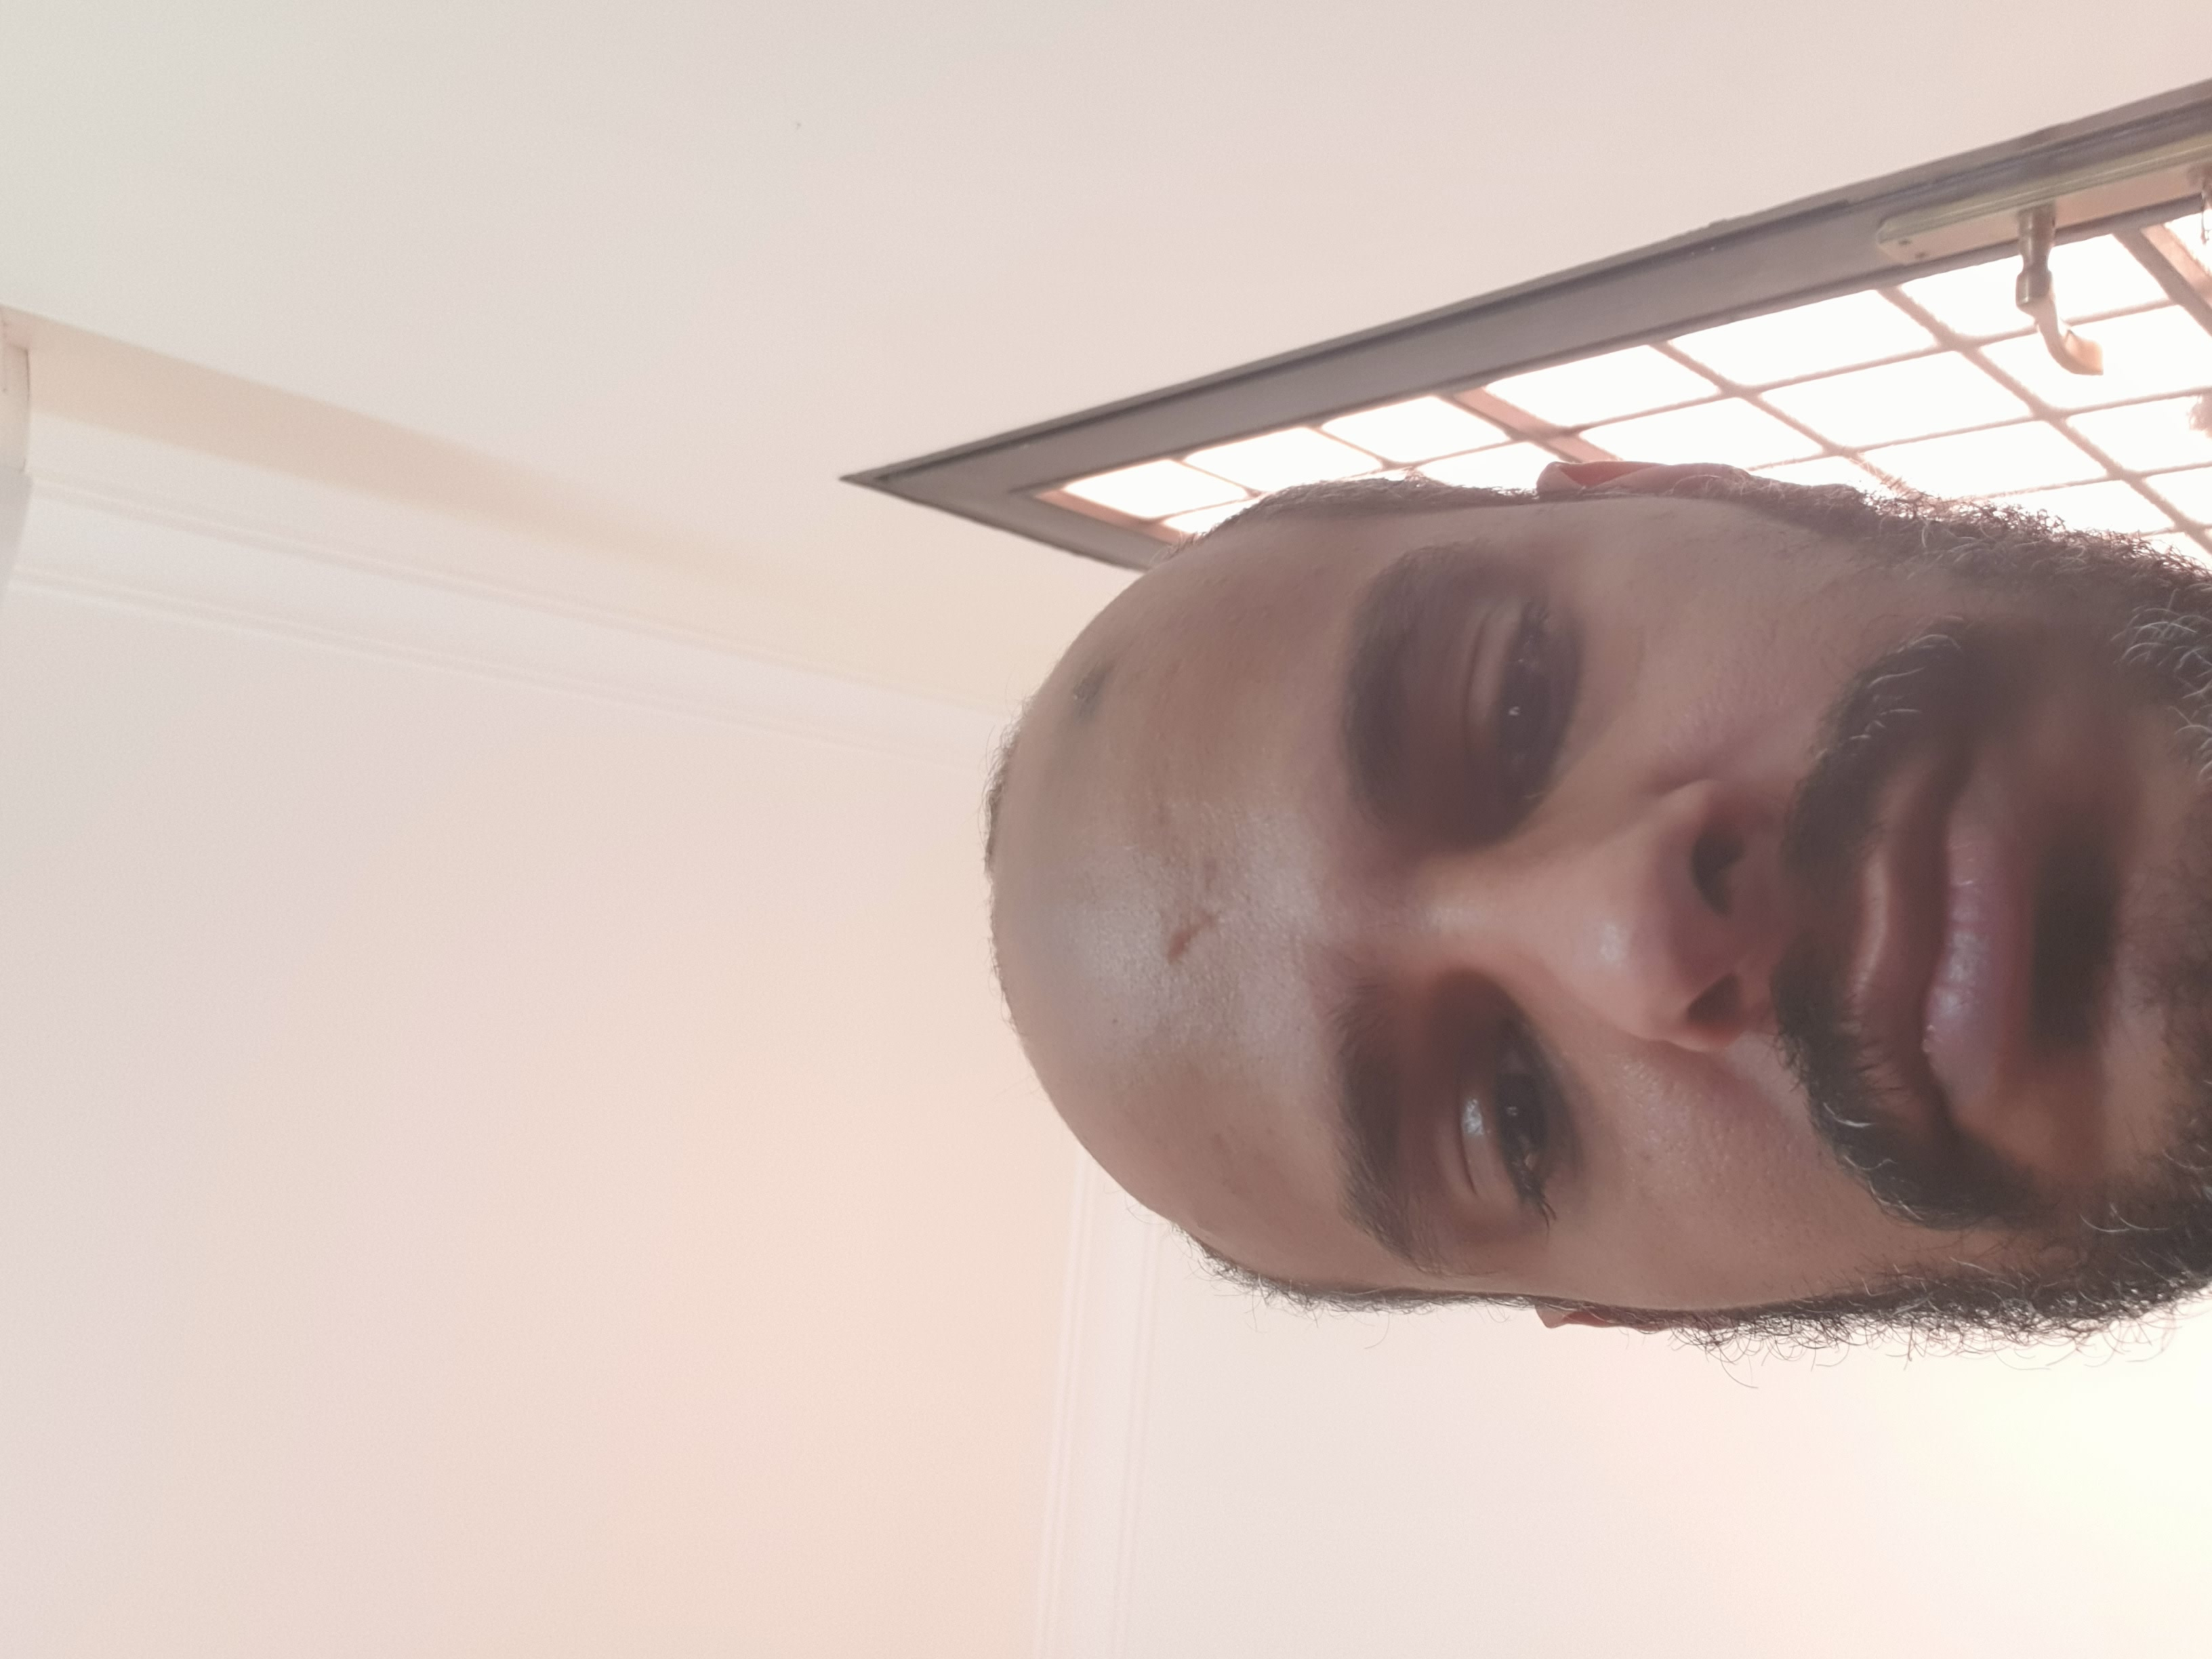 طارق سعد بن درويش المطيري Profile Picture